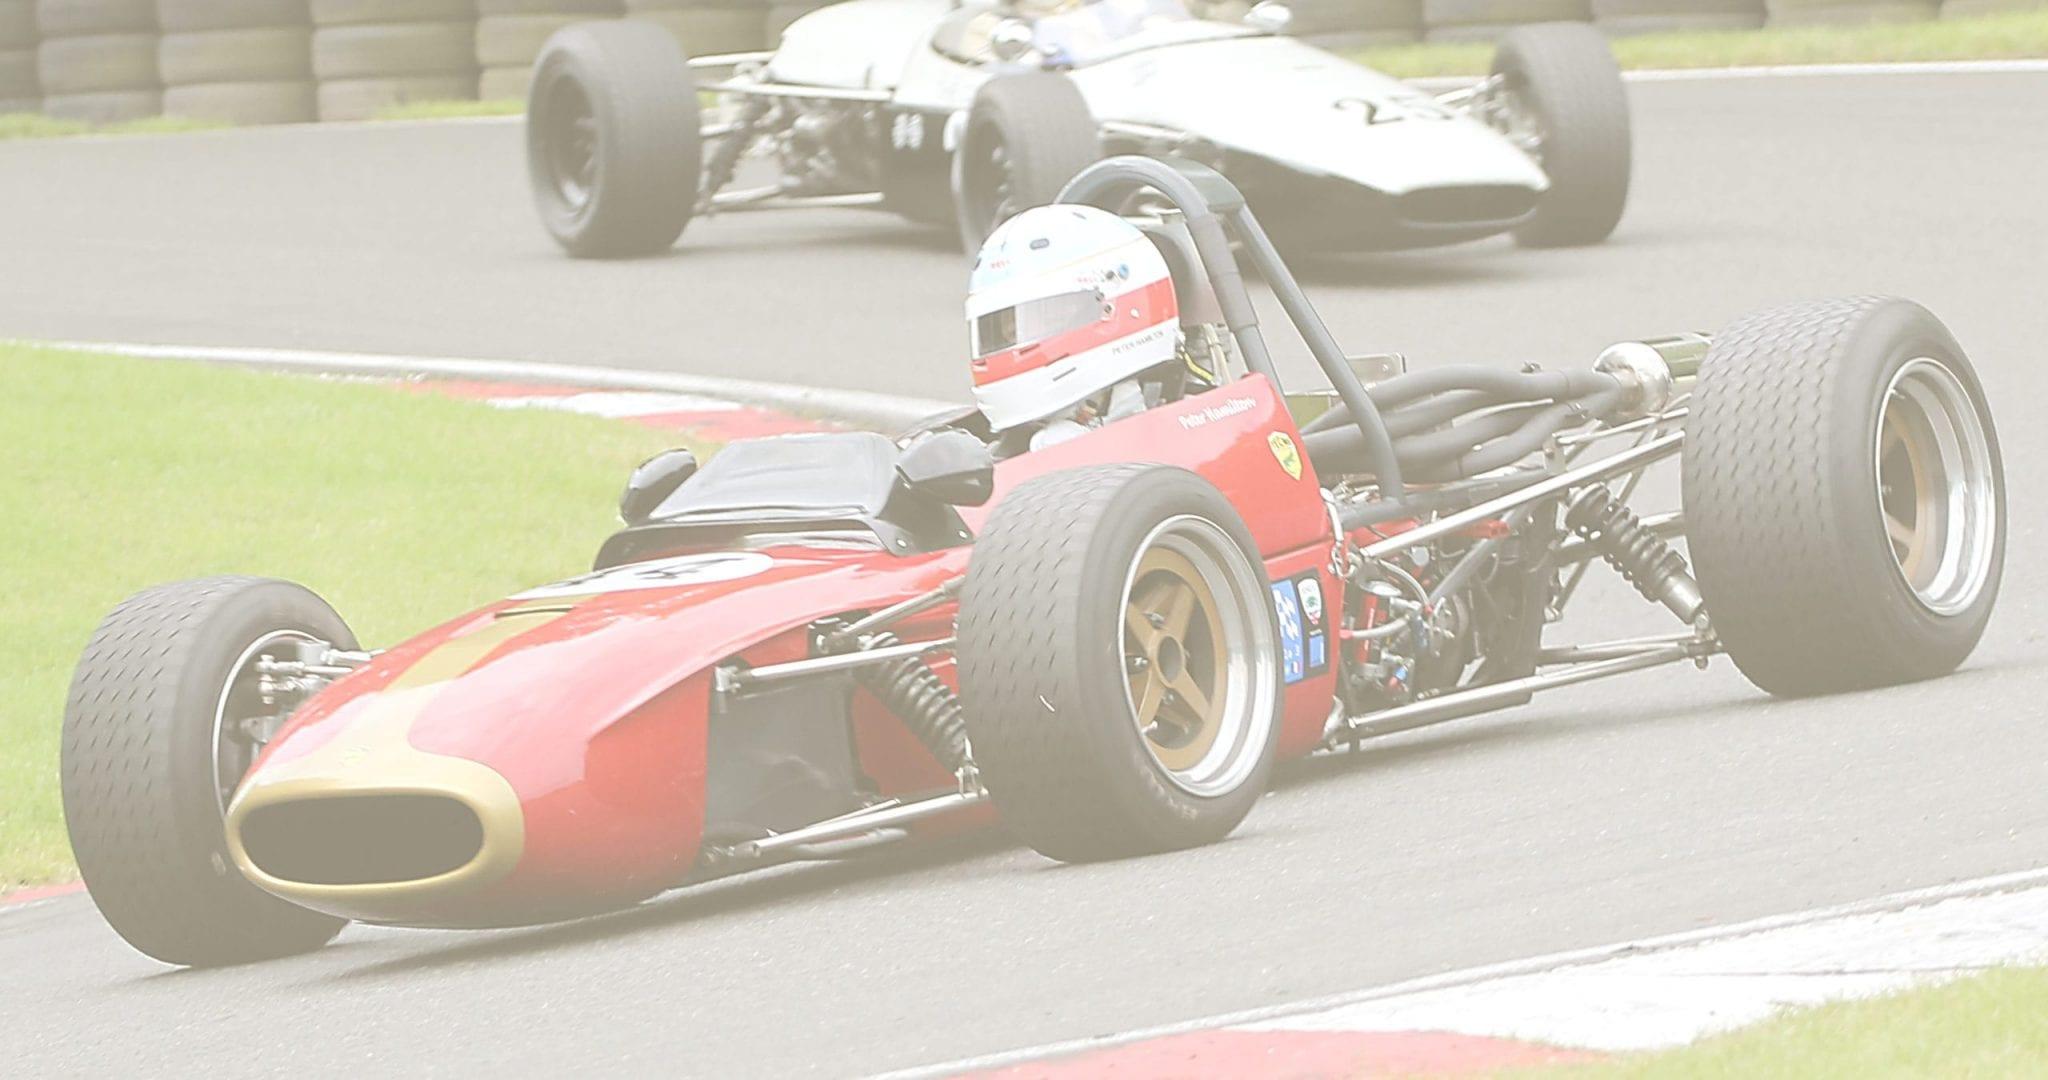 Peter Hamilton race driver